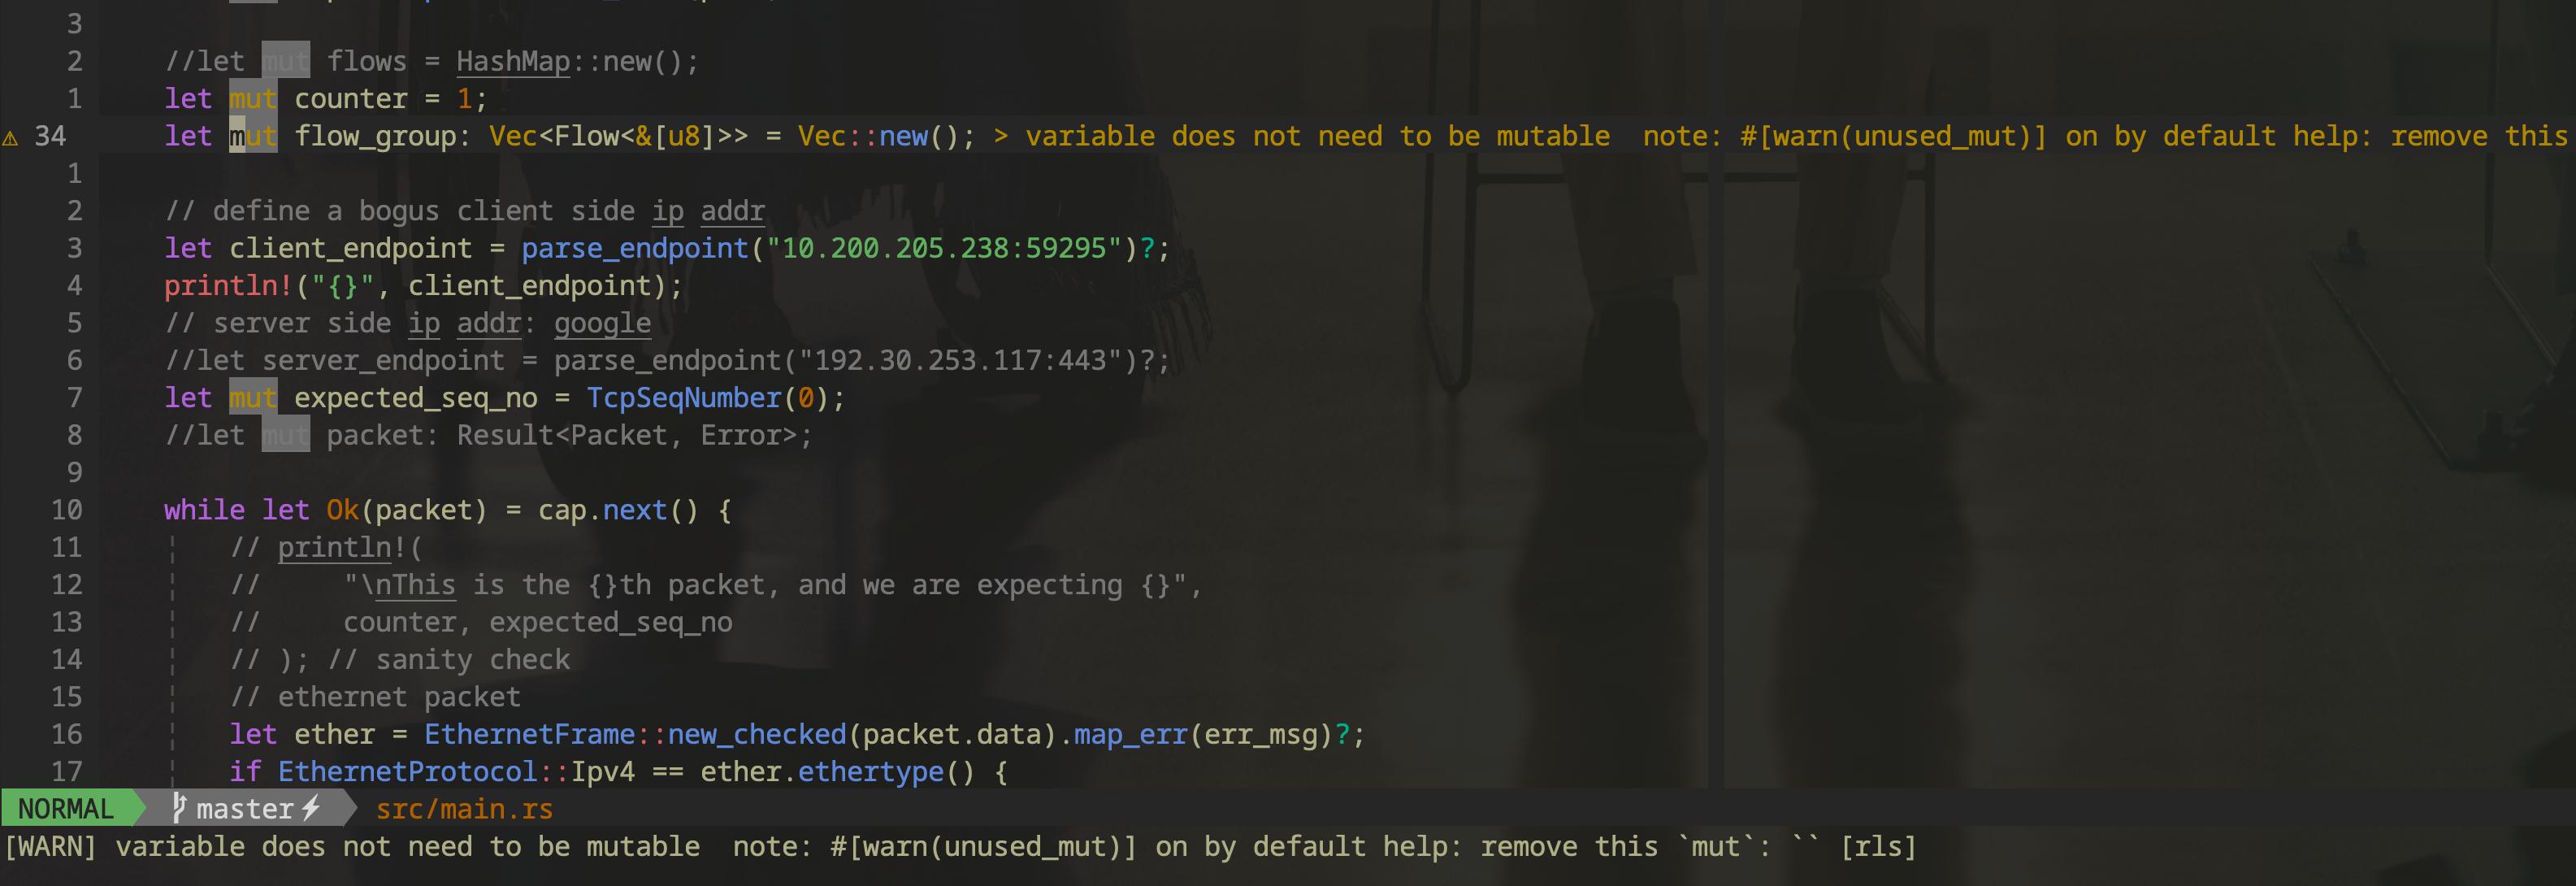 line breaks still show up in virtualtext · Issue #2476 · dense